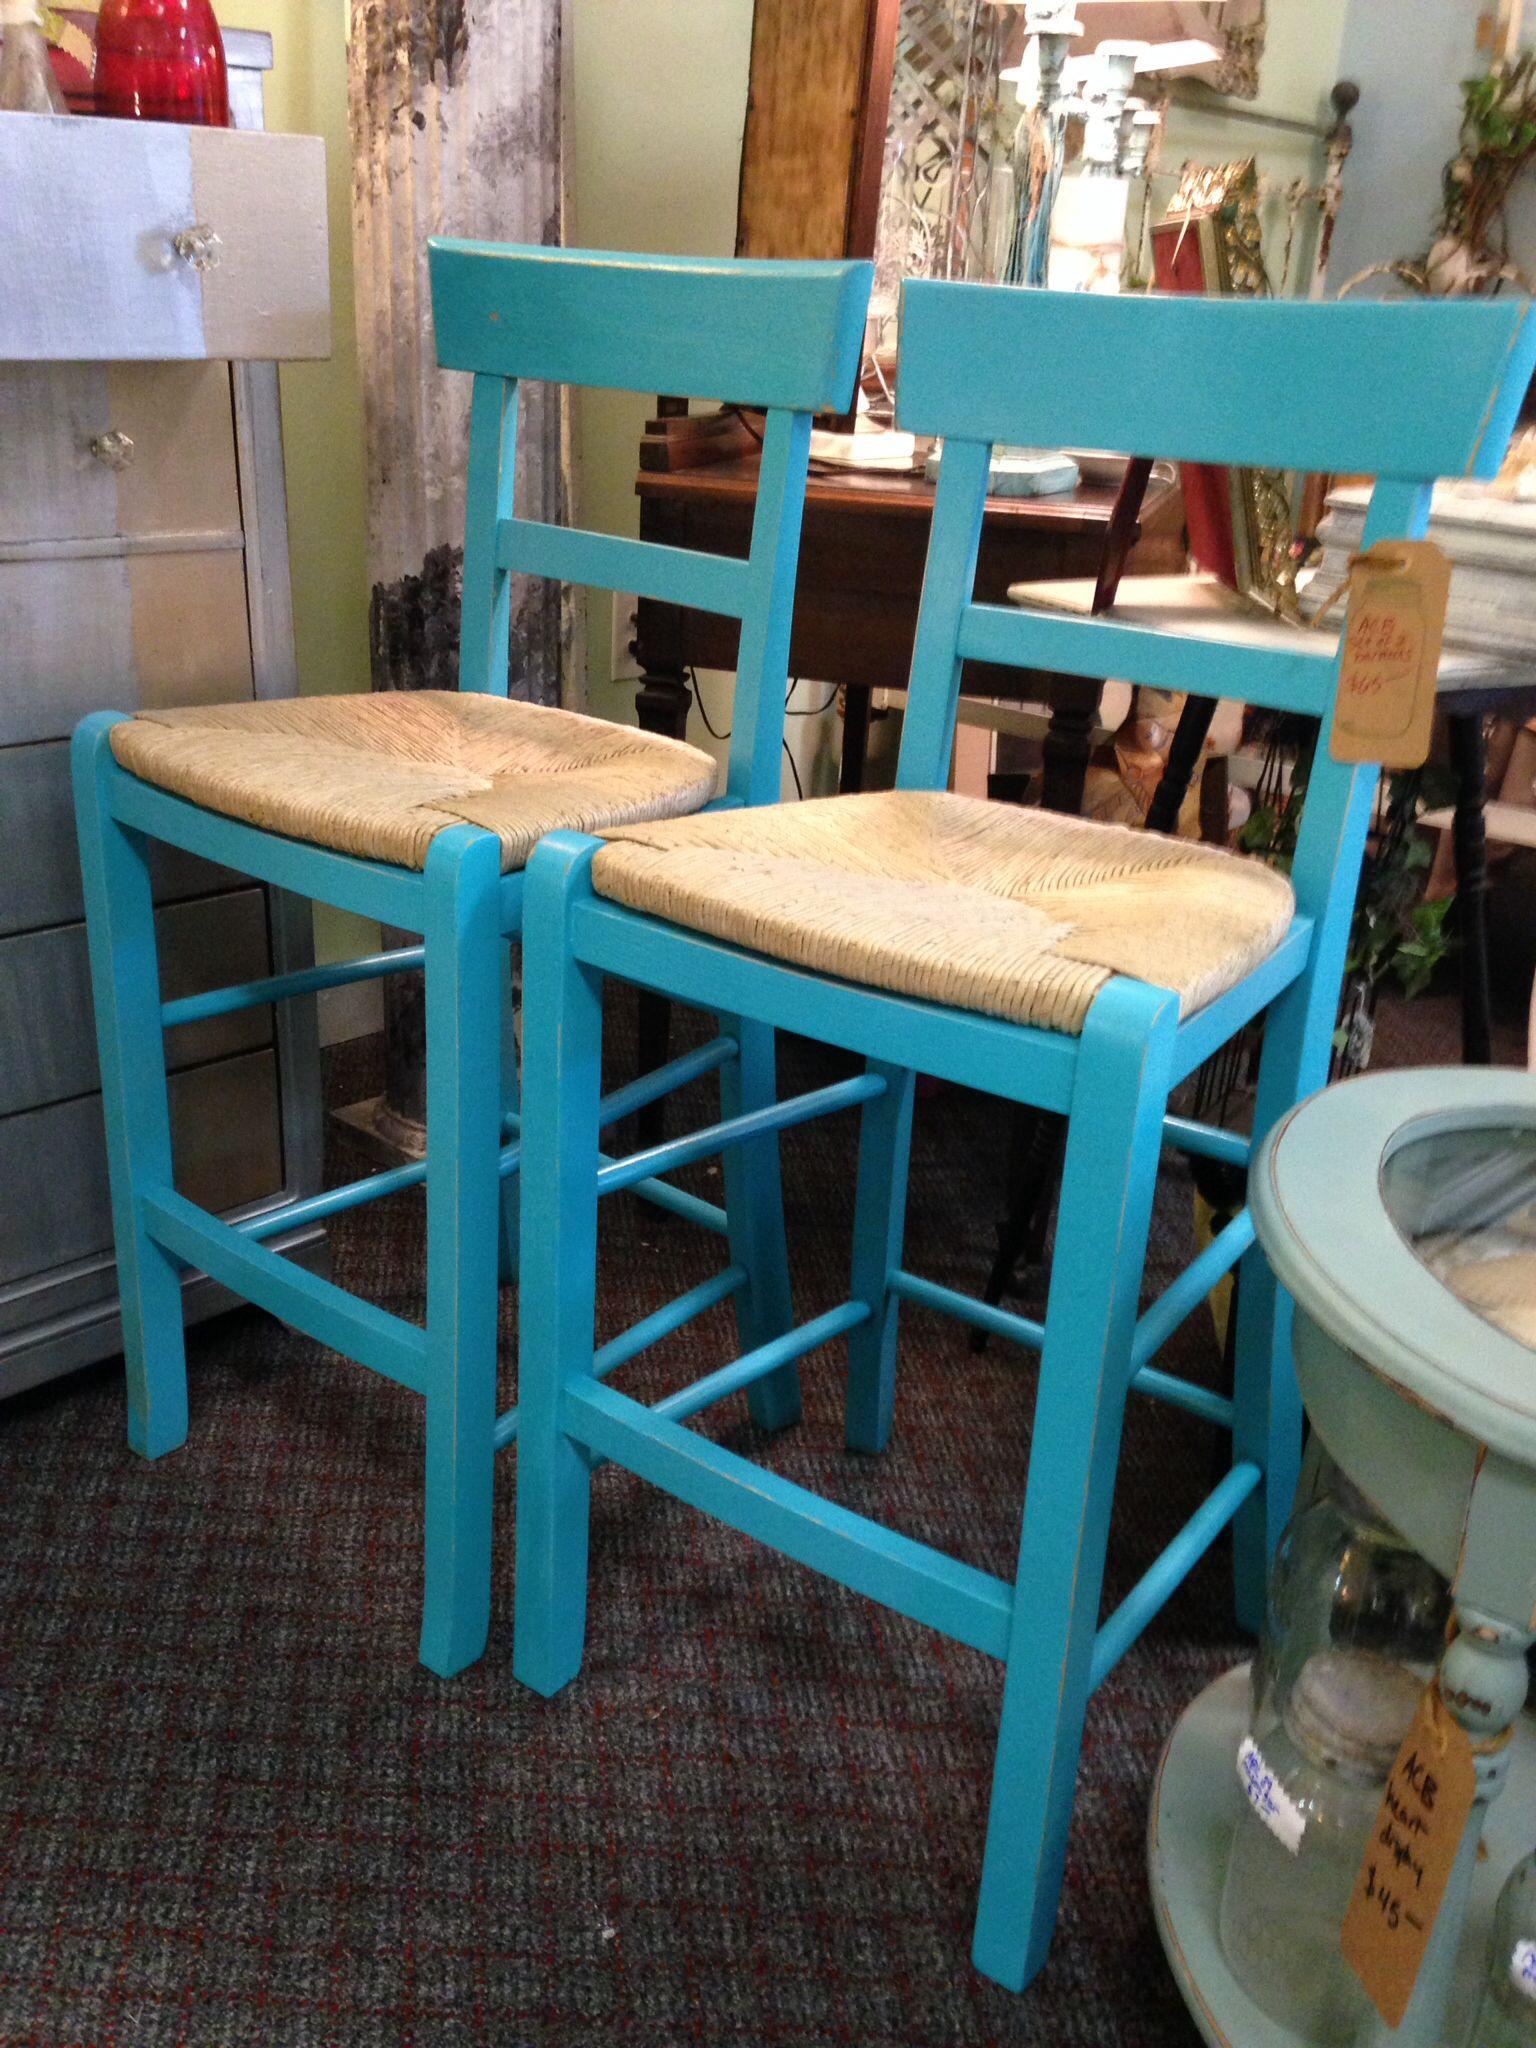 Peachy Tall Shabby Chic Bar Stool Angelicas Cottage Furnishings Machost Co Dining Chair Design Ideas Machostcouk